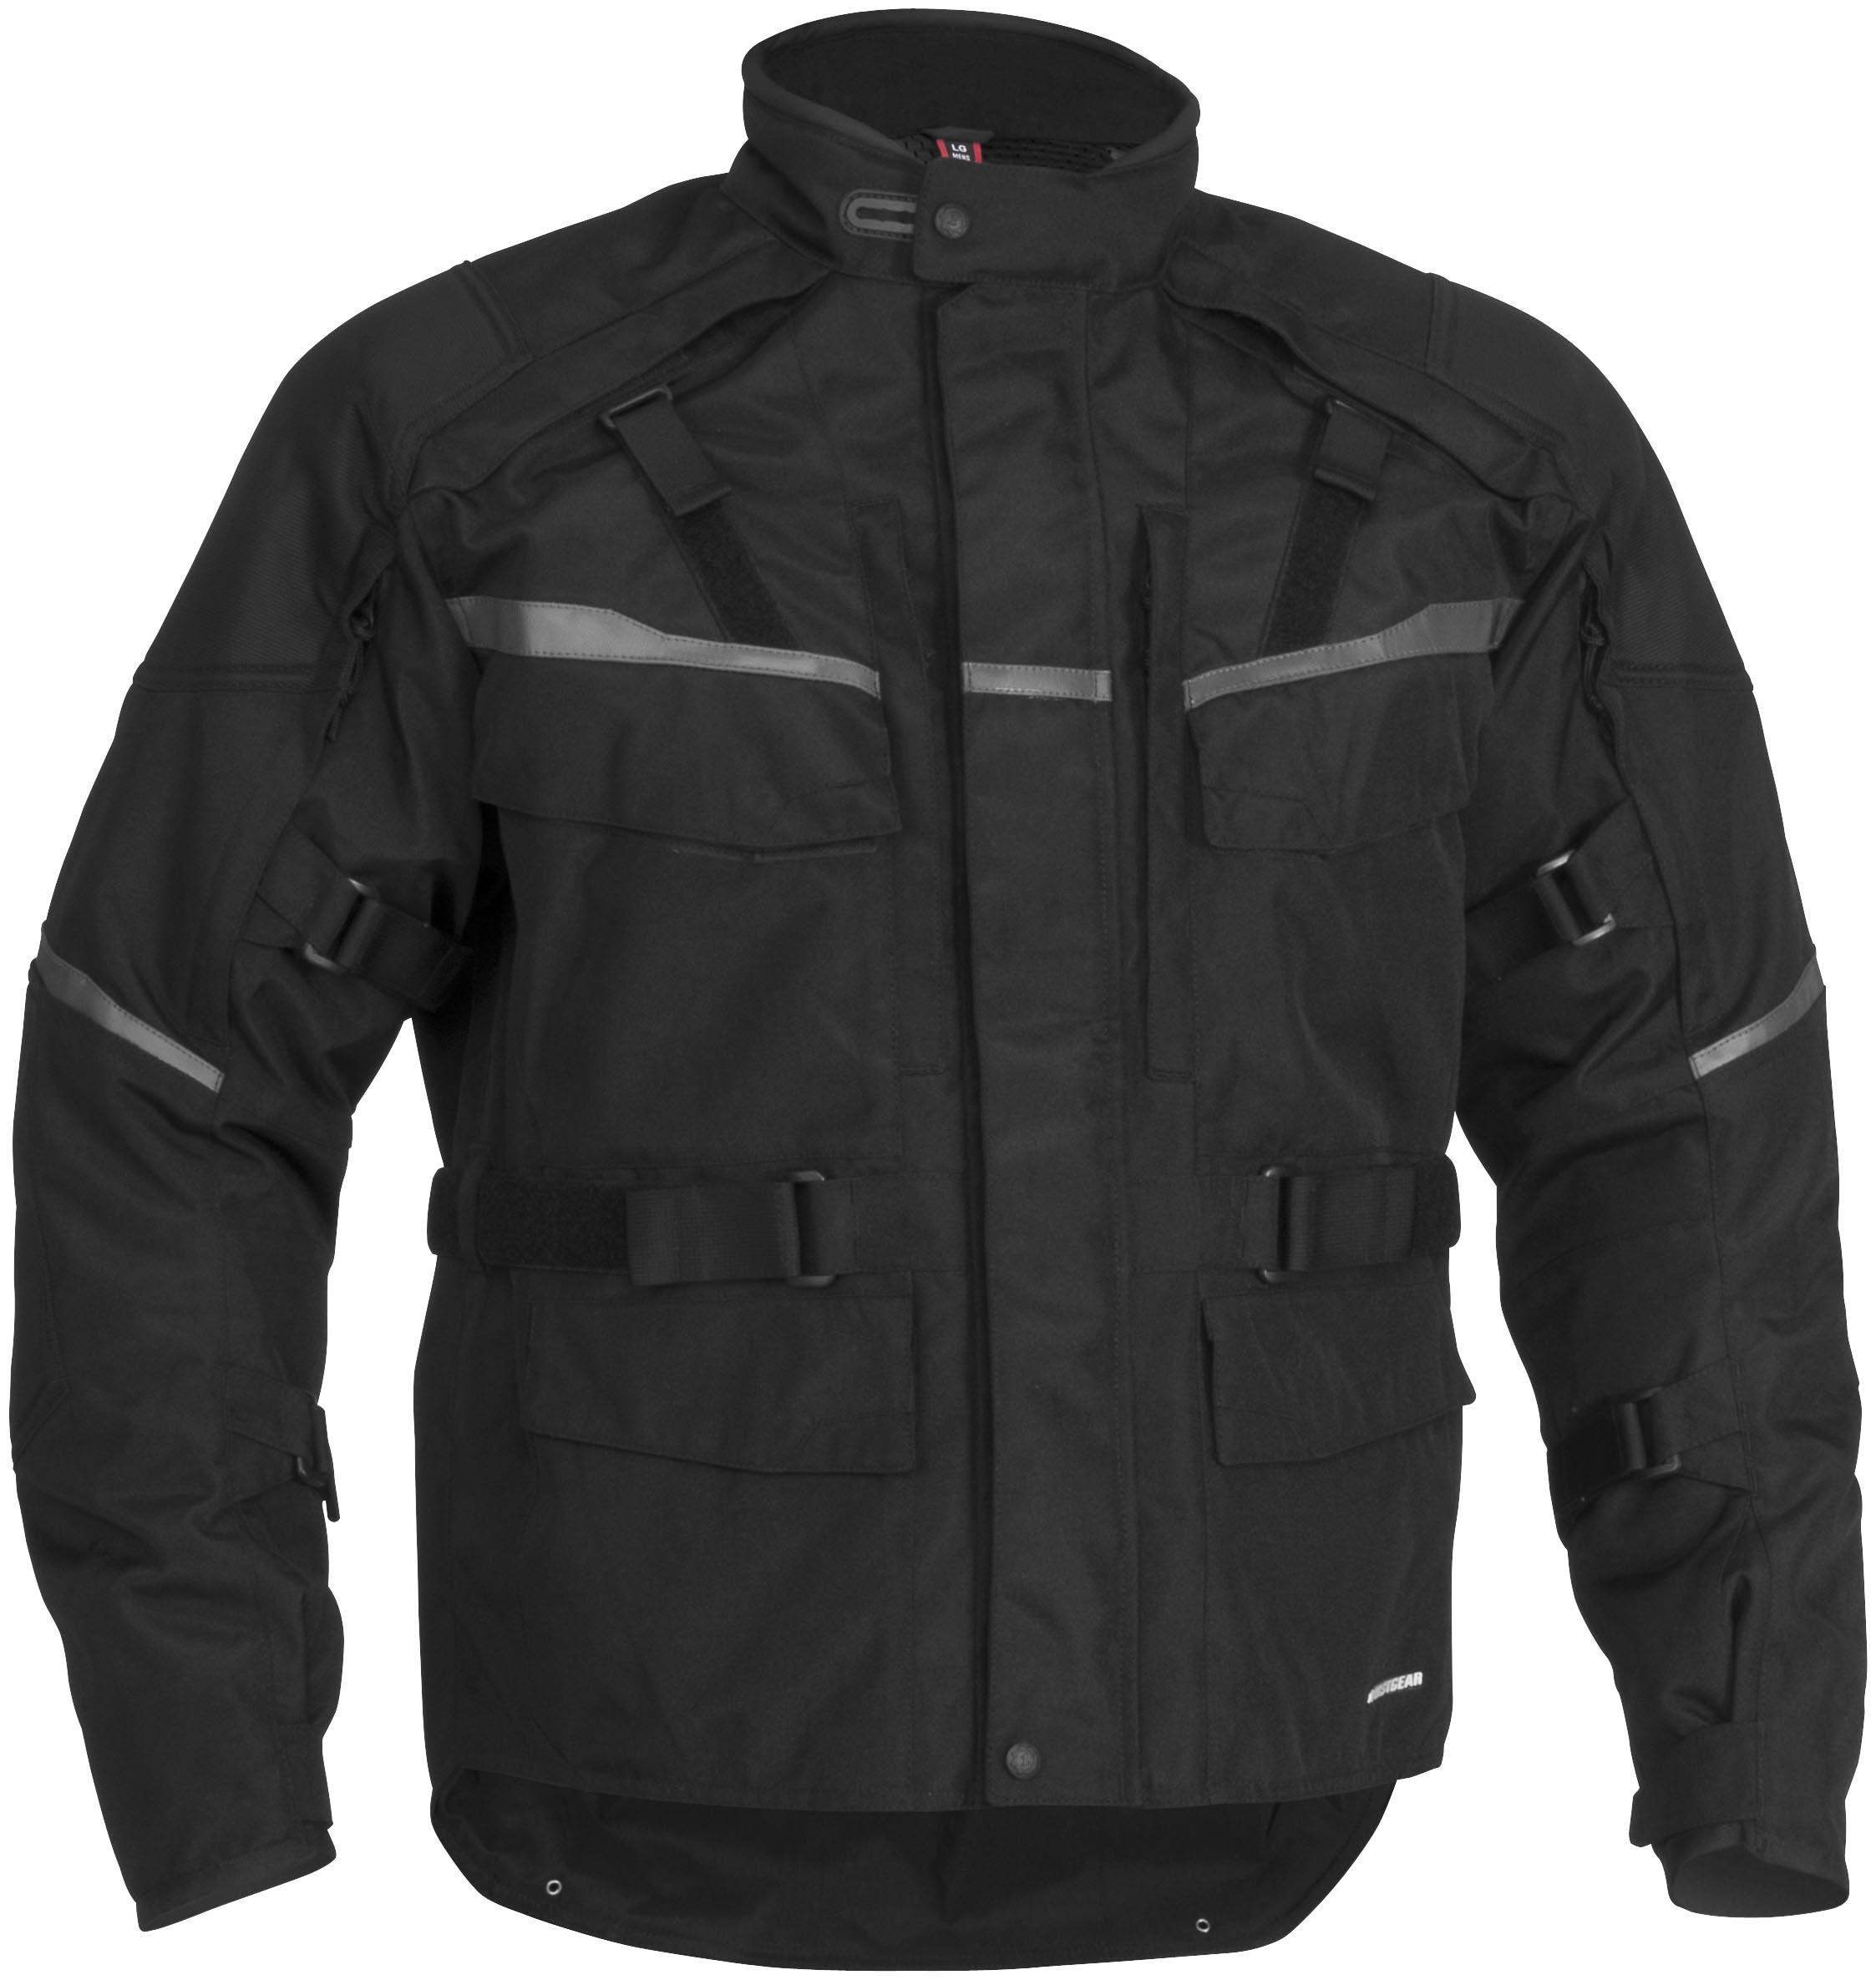 Firstgear Jaunt 12 Jacket